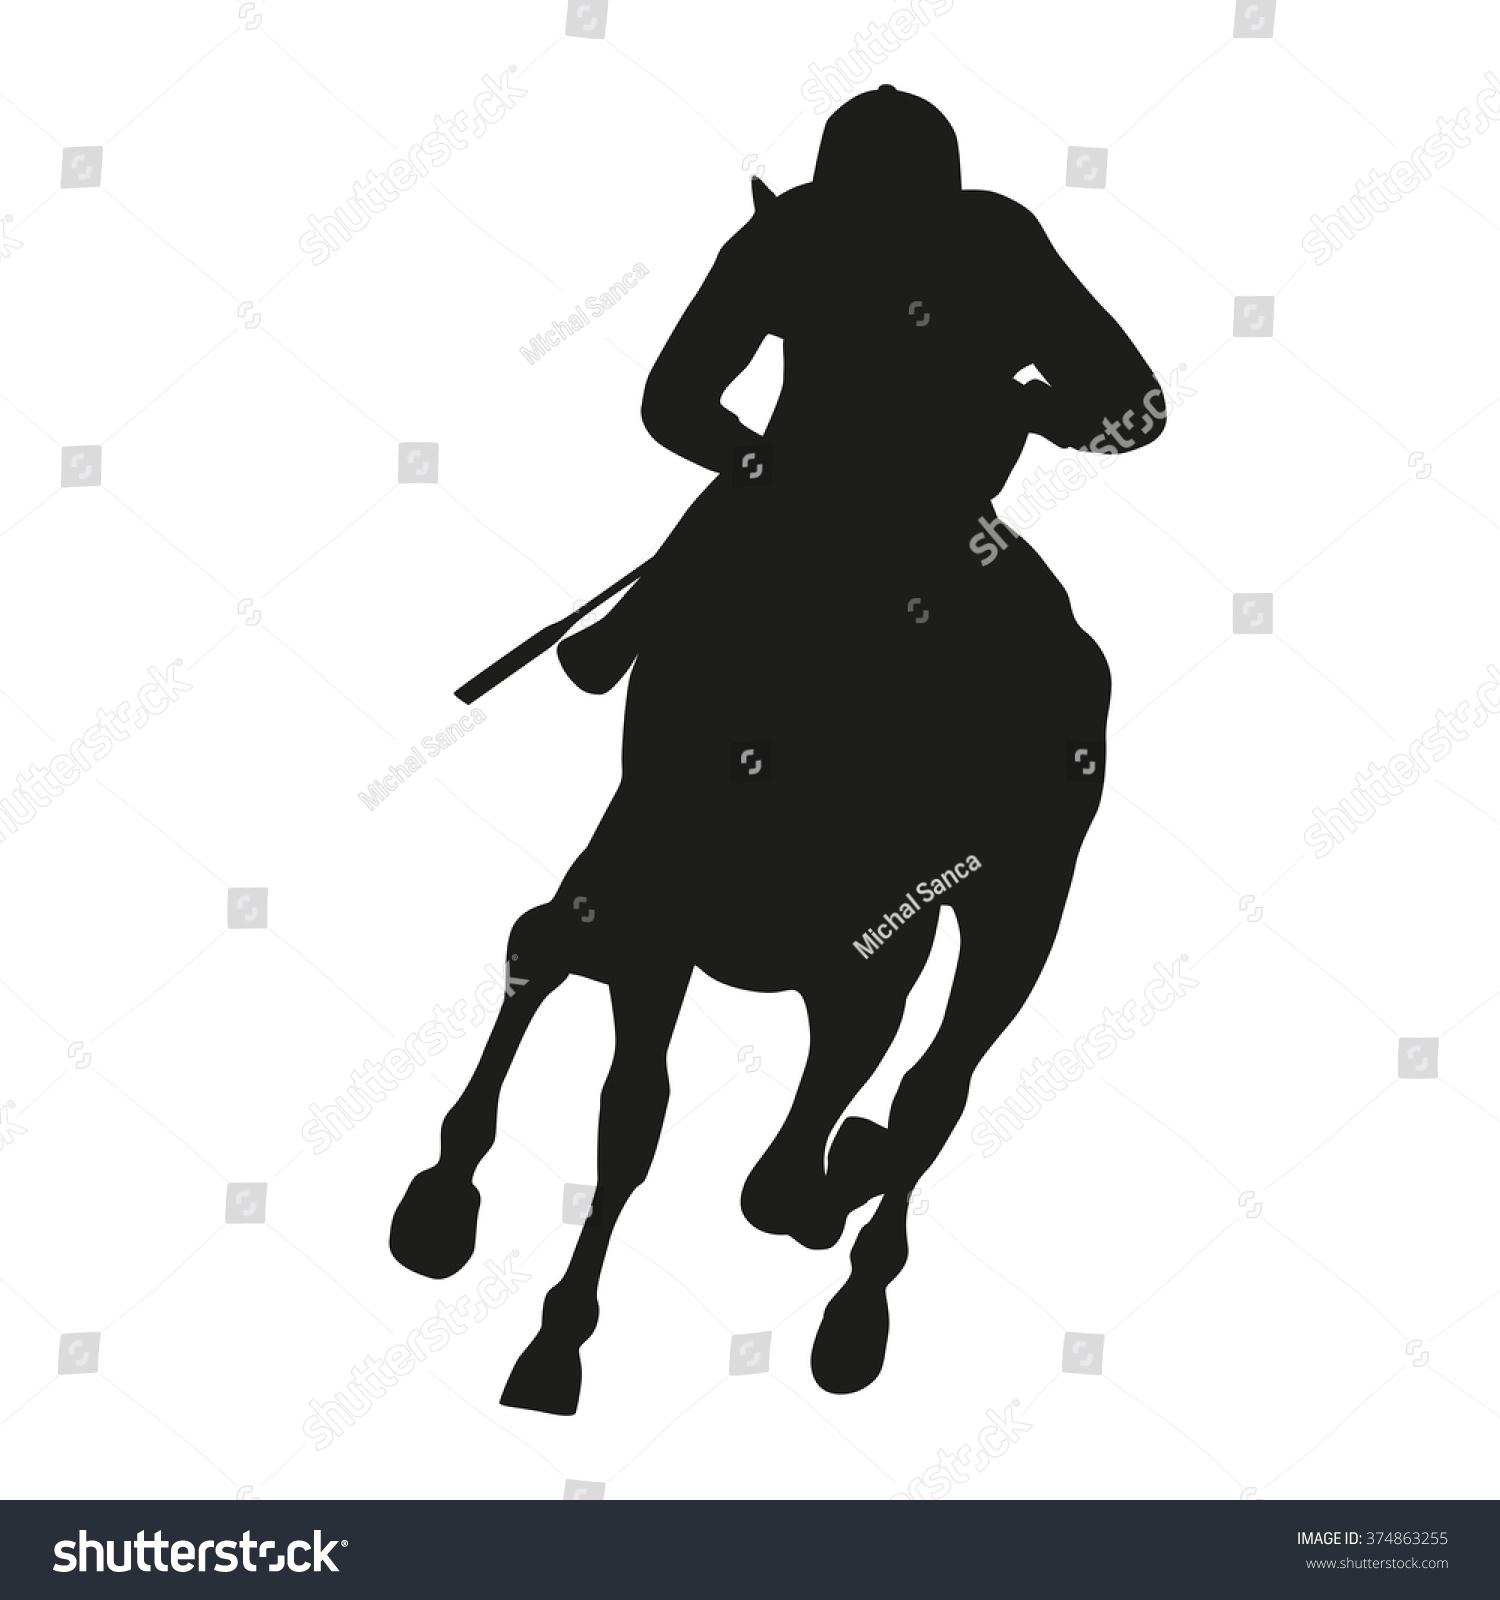 Horse Racing, Vector Silhouette Running Horse And Jockey ...